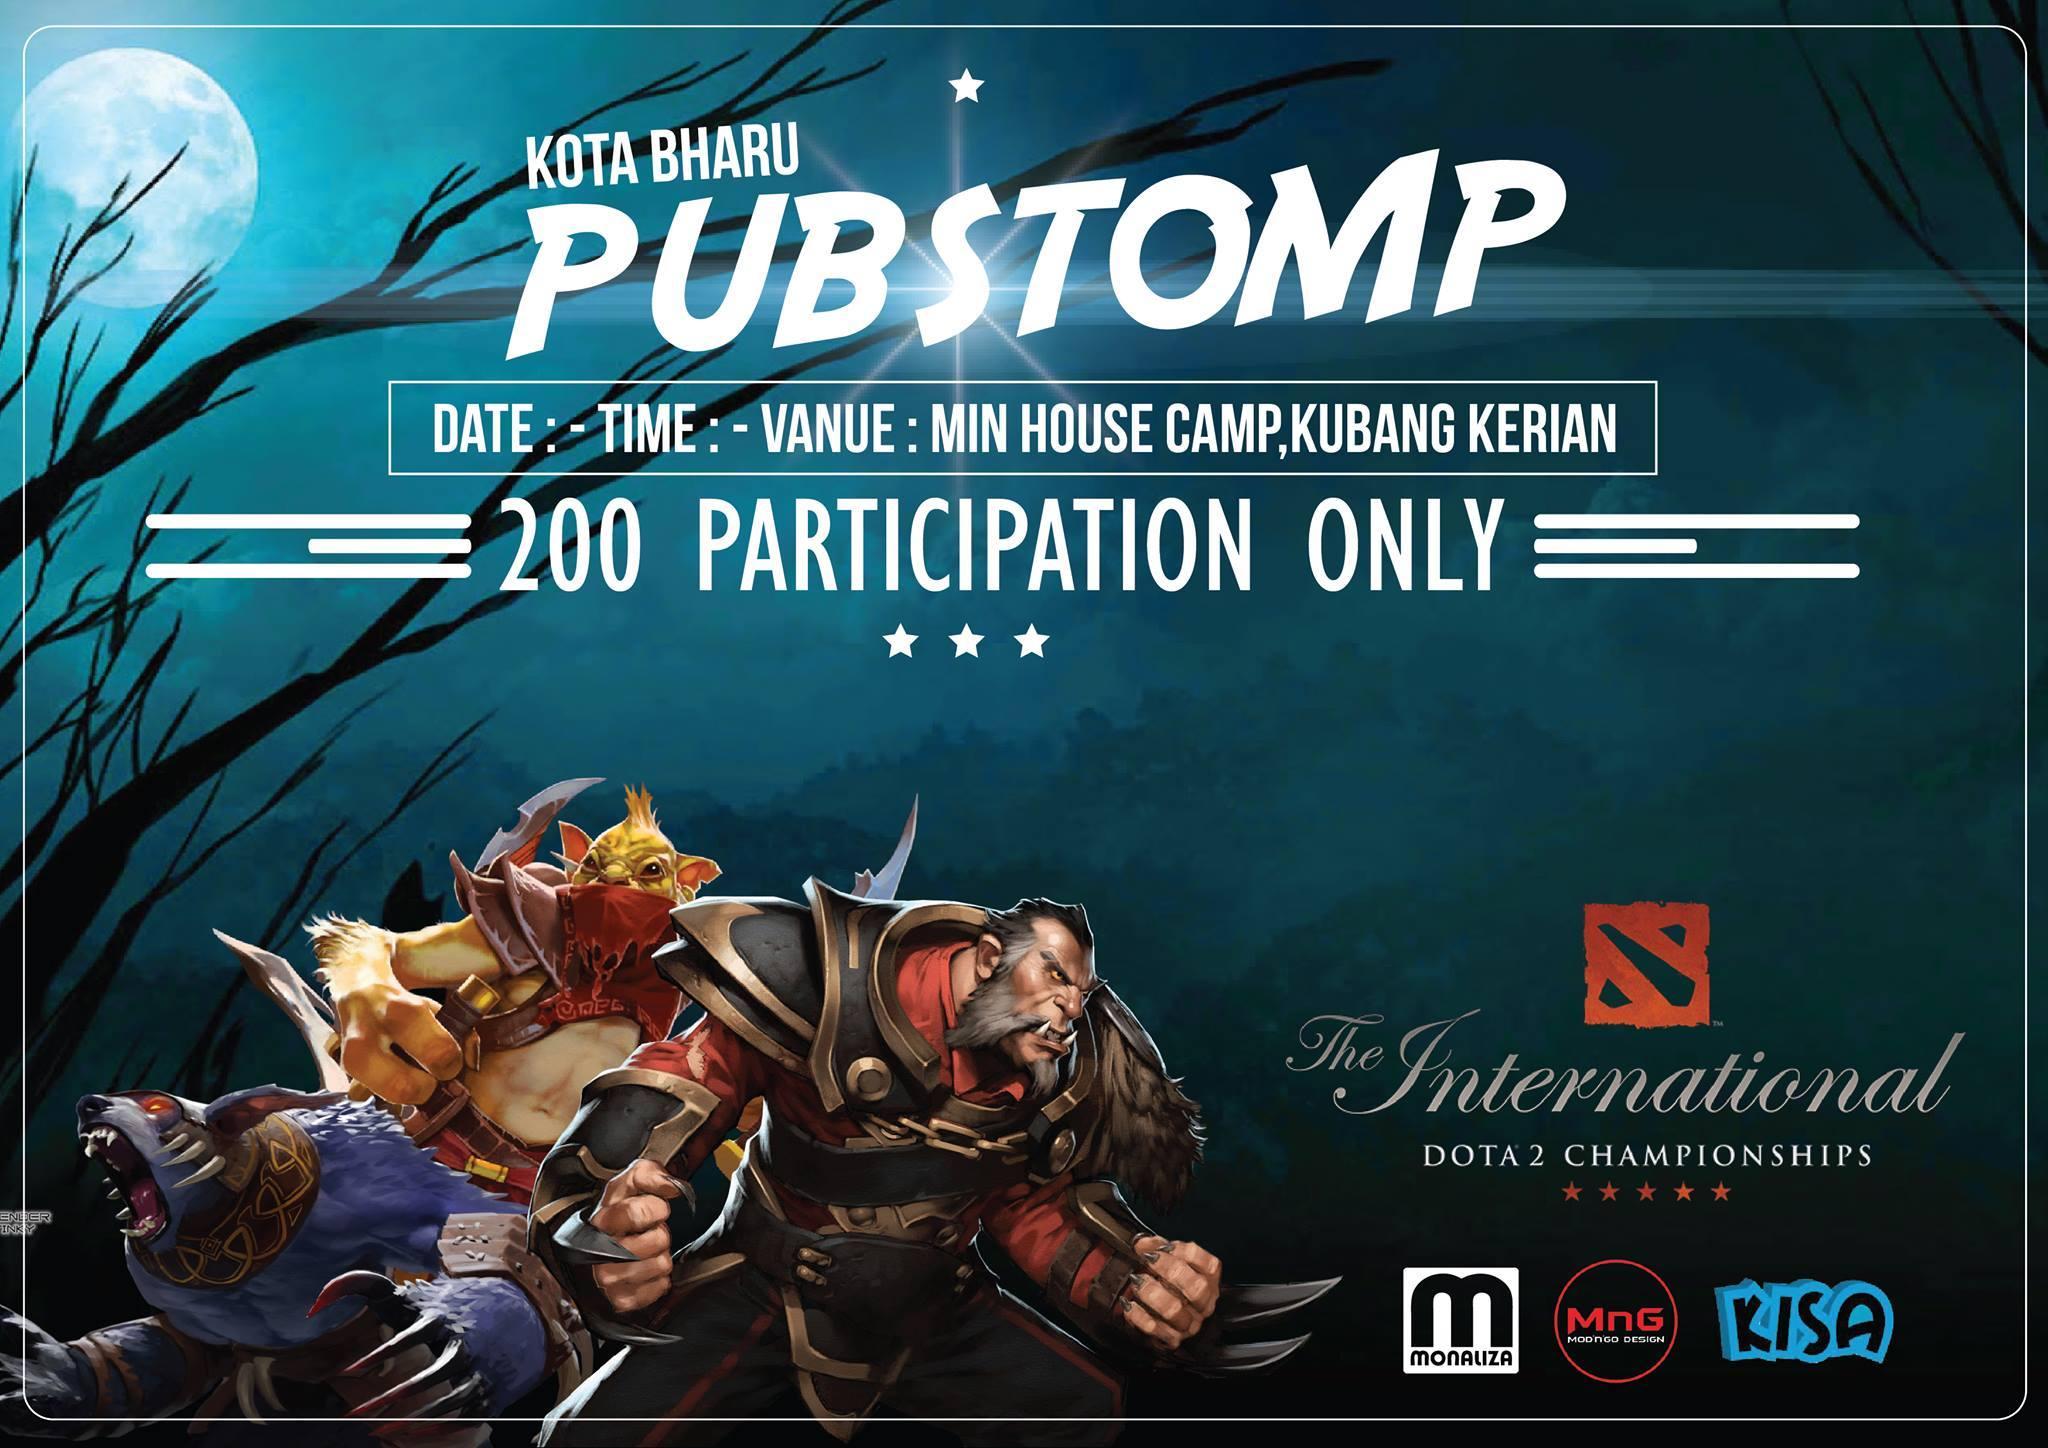 DOTA2 The International - Pubstomp East Coast, Malaysia 2